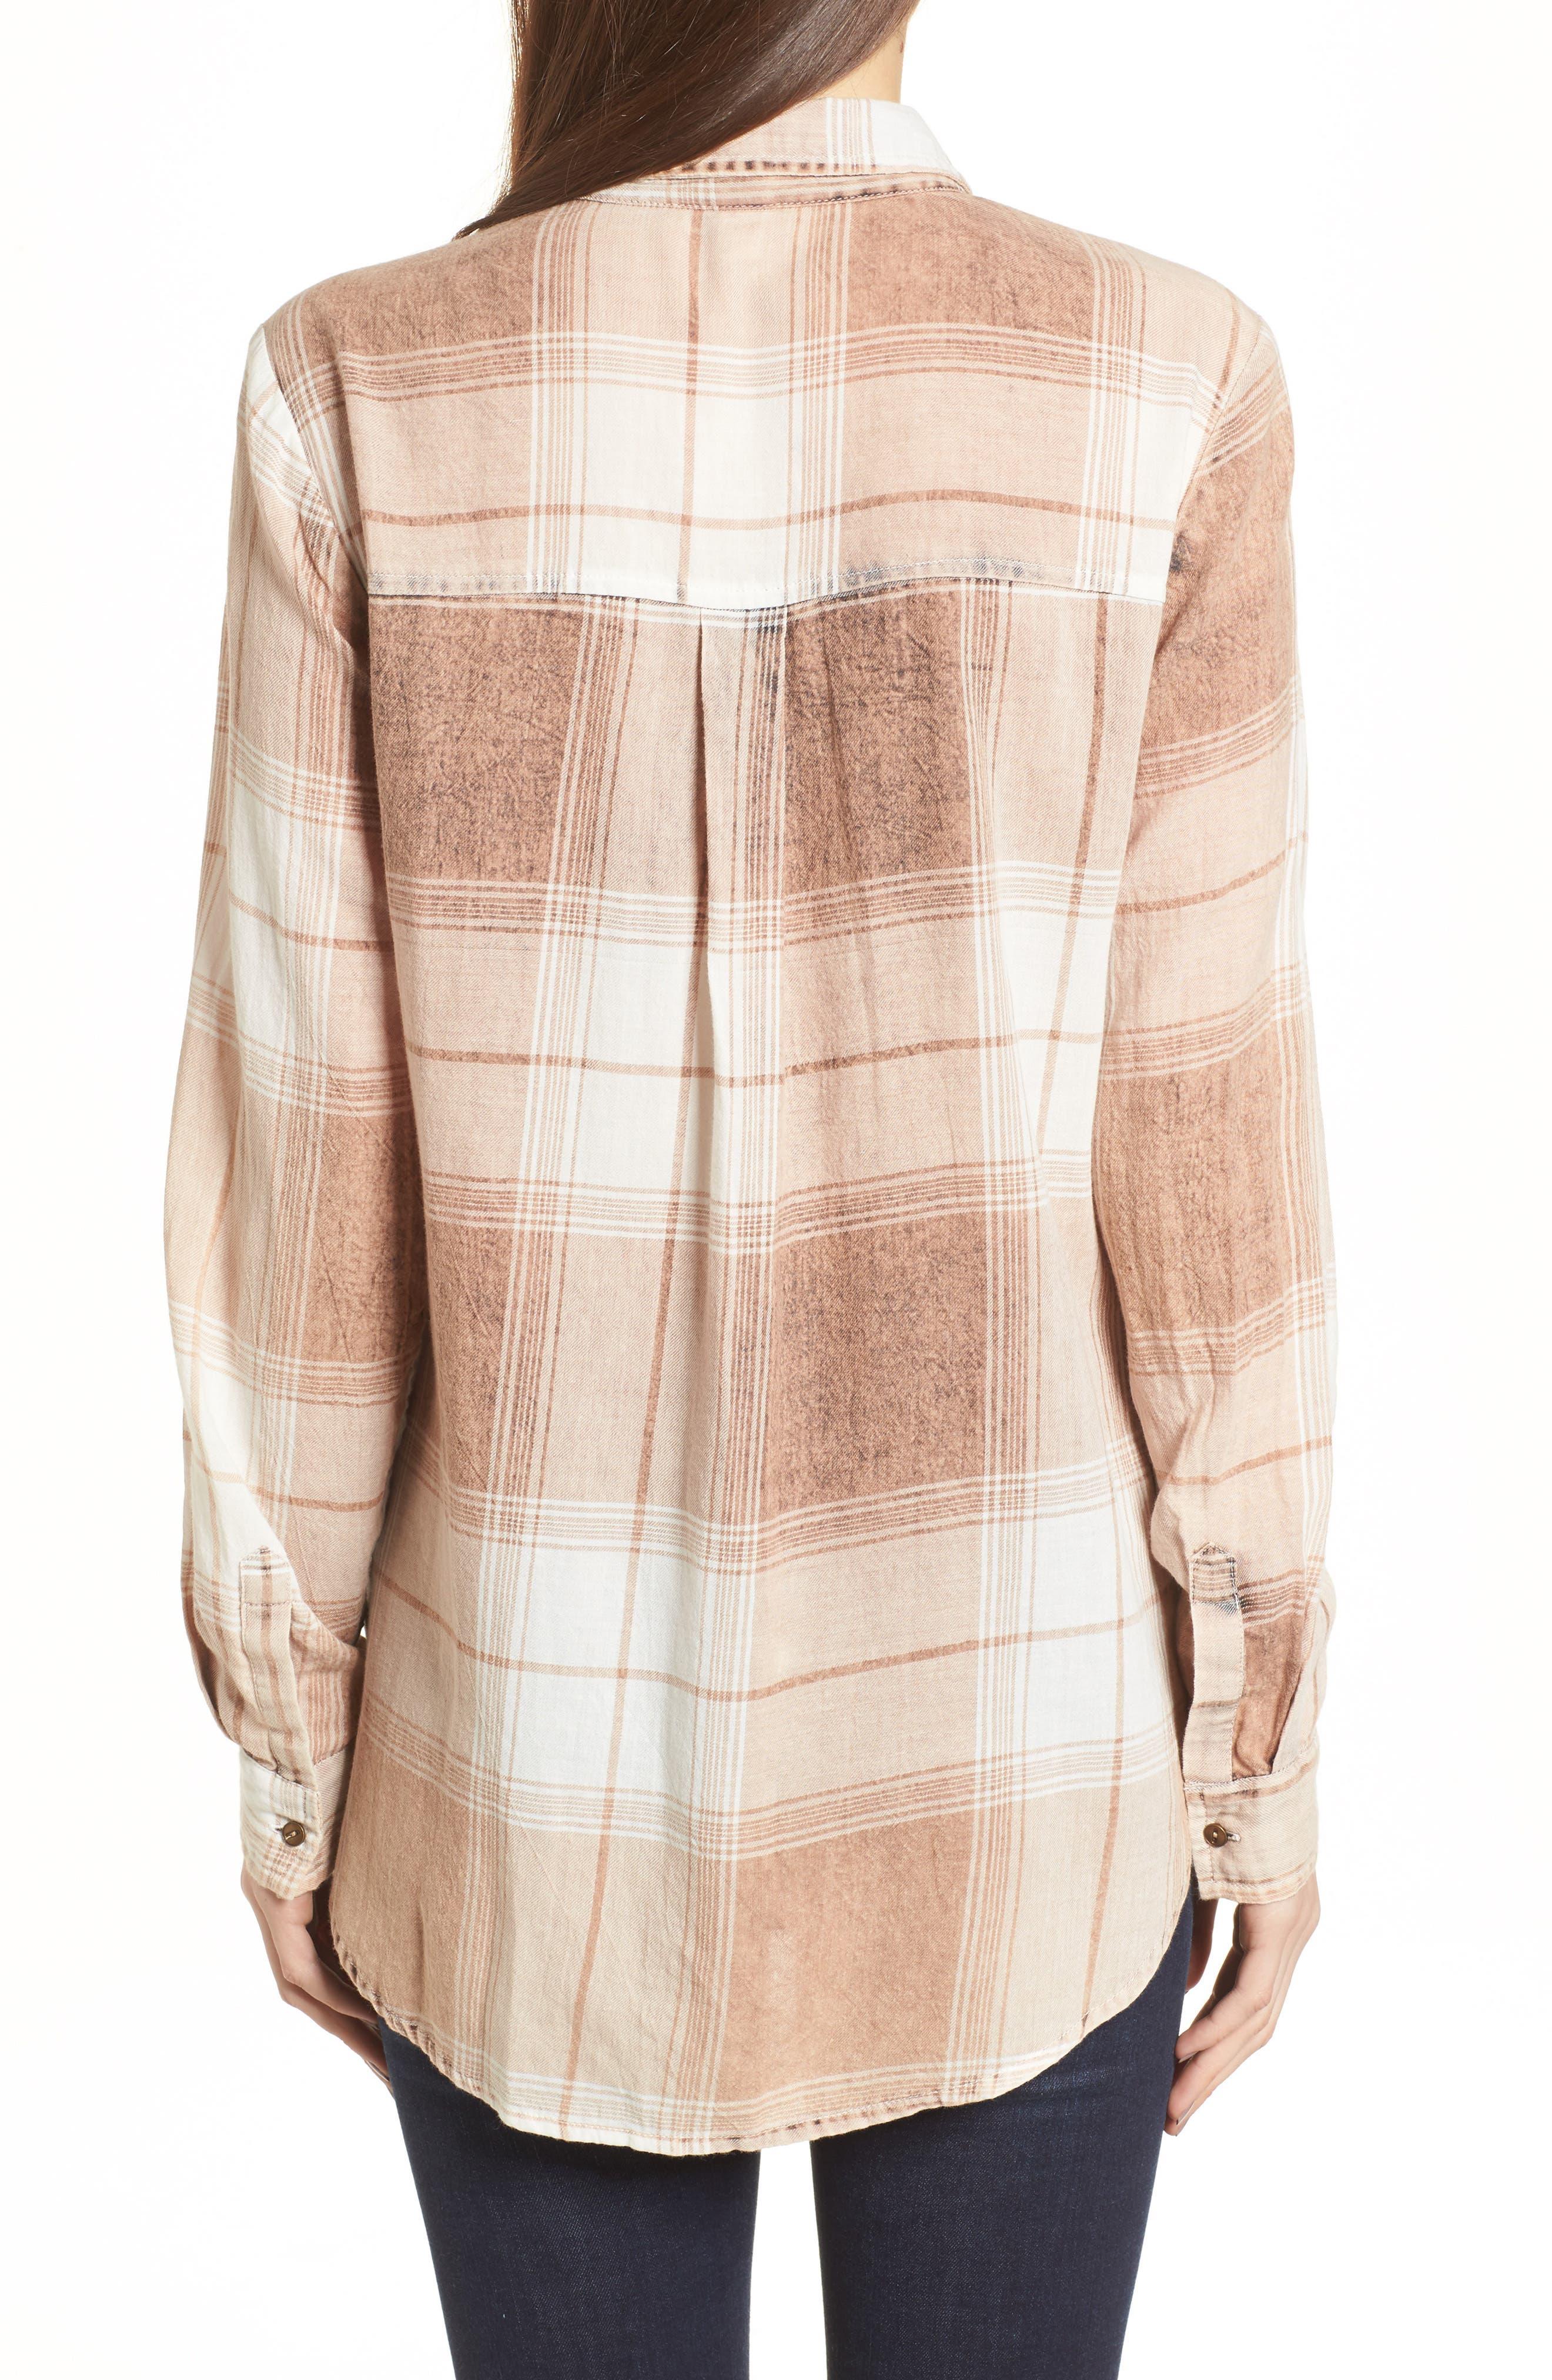 Plaid Button Up Shirt,                             Alternate thumbnail 2, color,                             Tan Nomad Freida Plaid